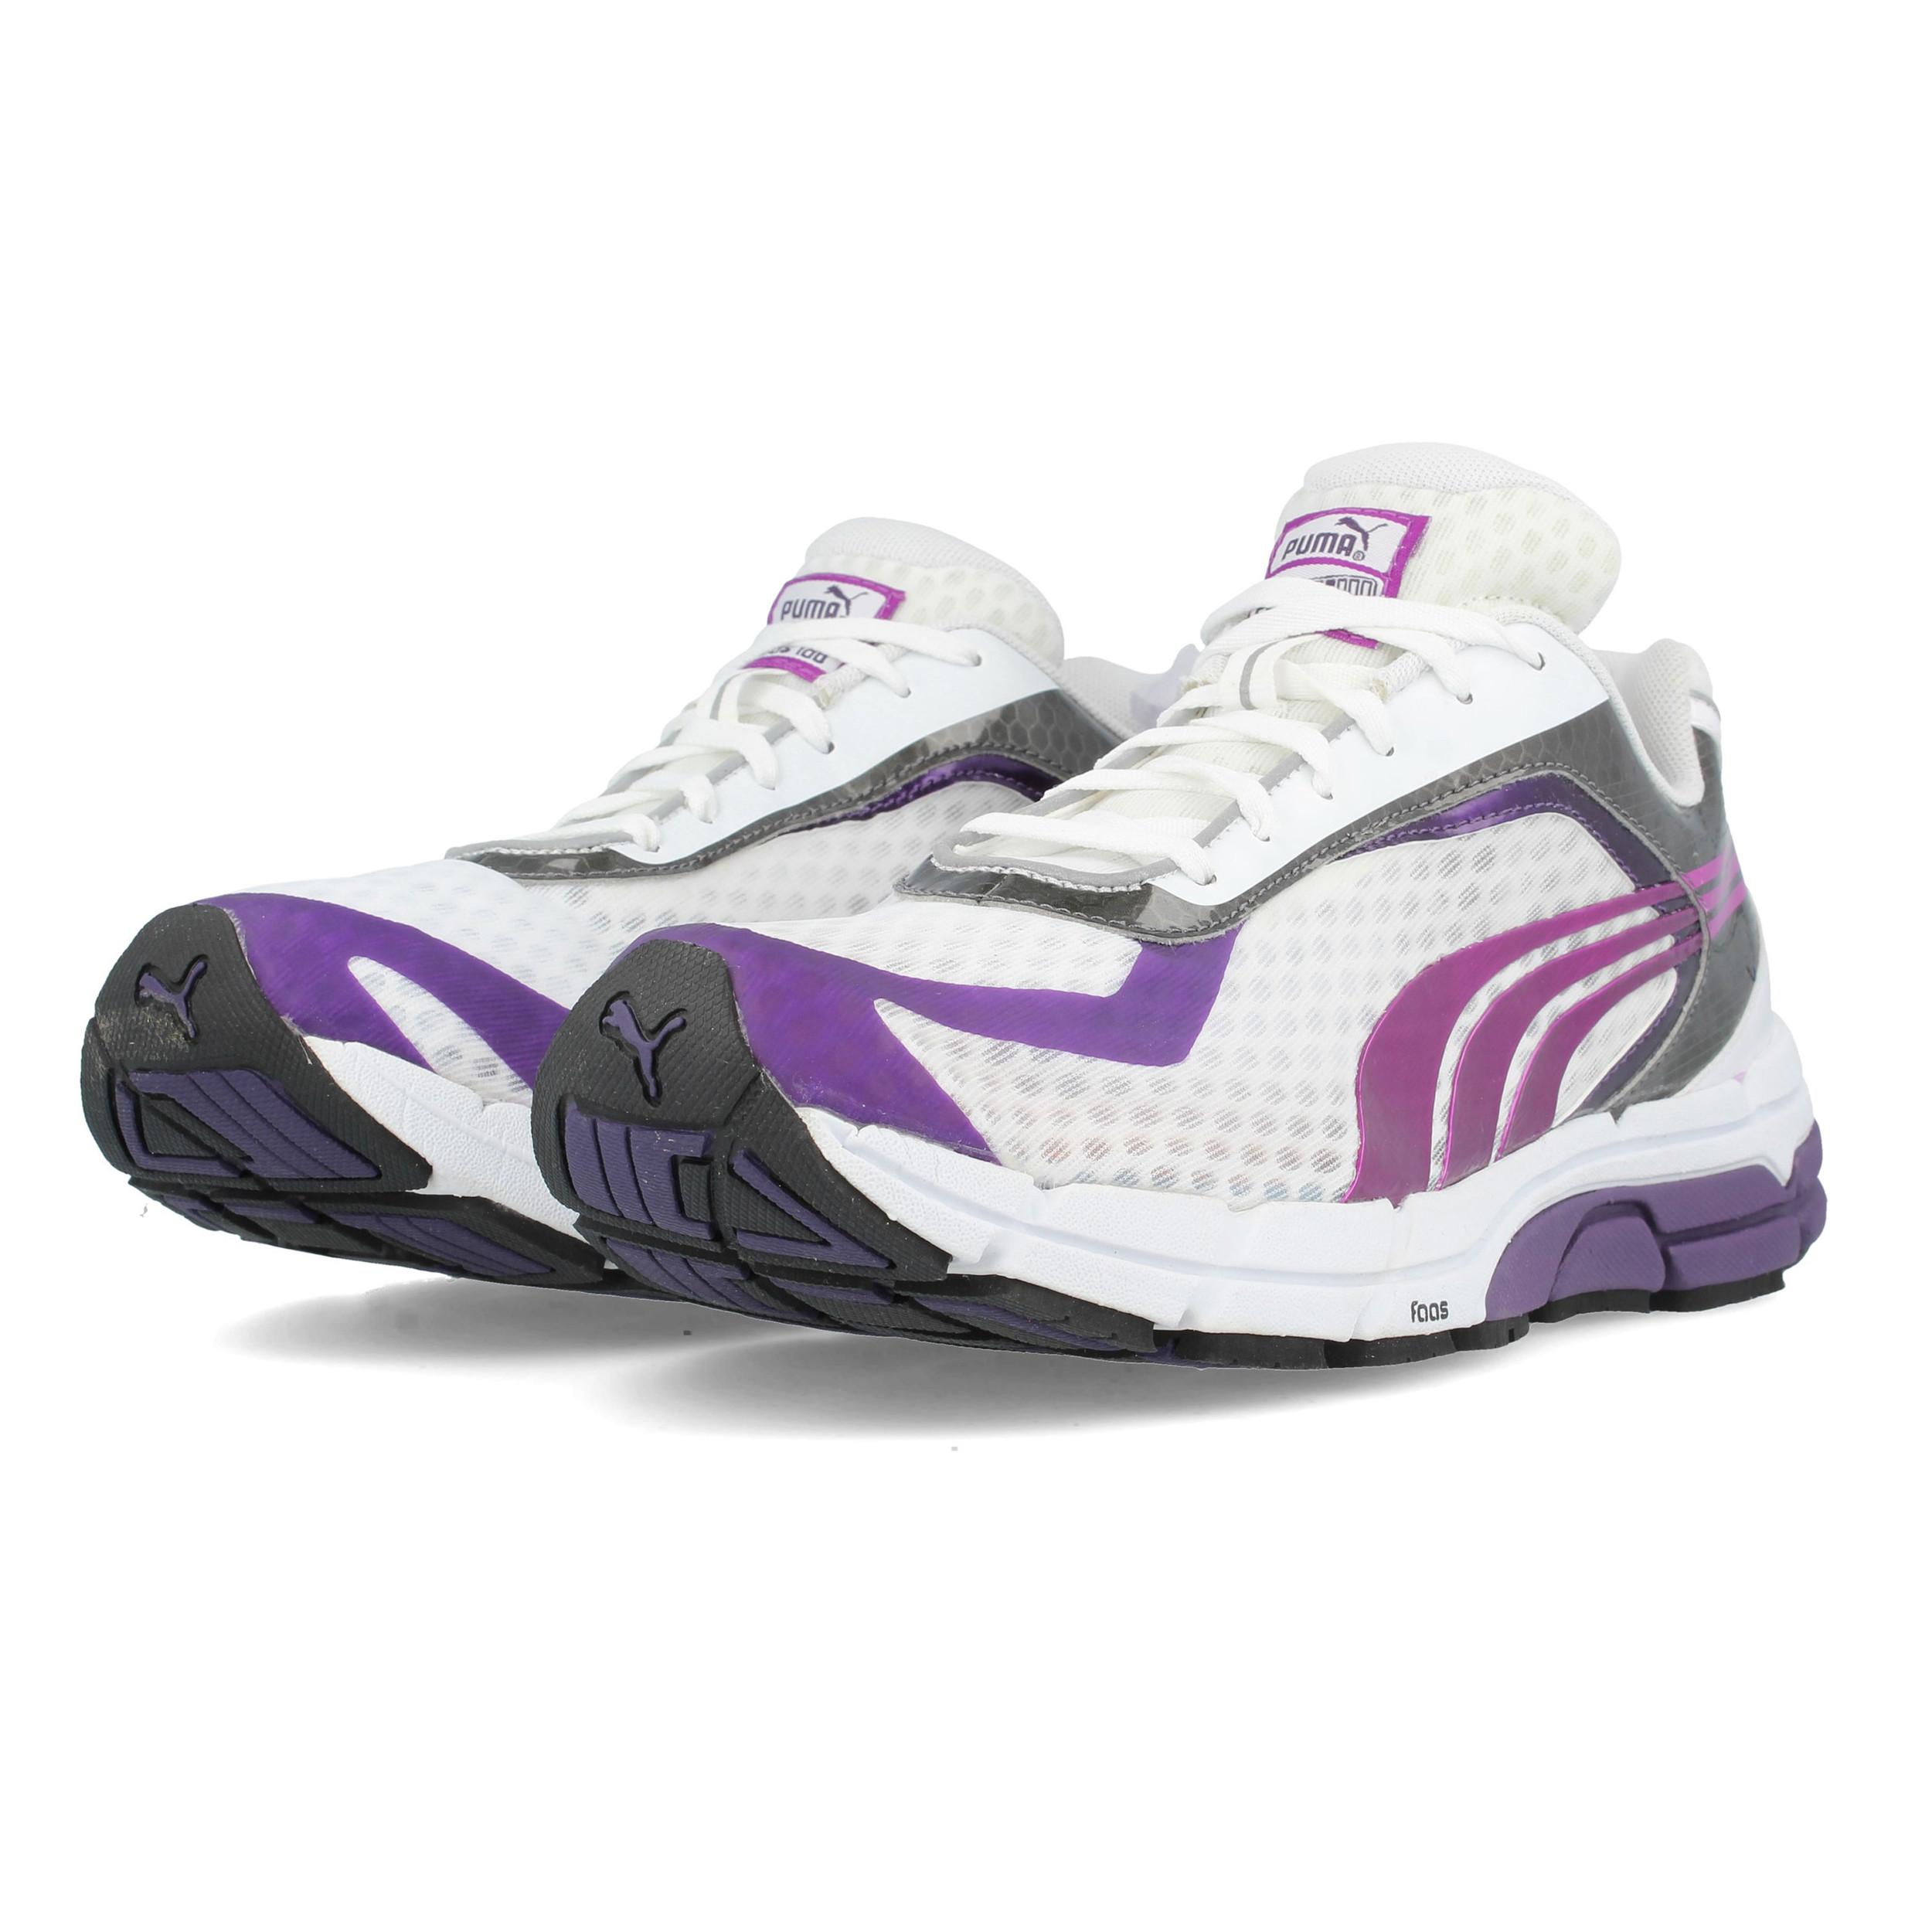 Dettagli su Puma Faas 500 S Donna Scarpe Fitness Running Sneaker Viola